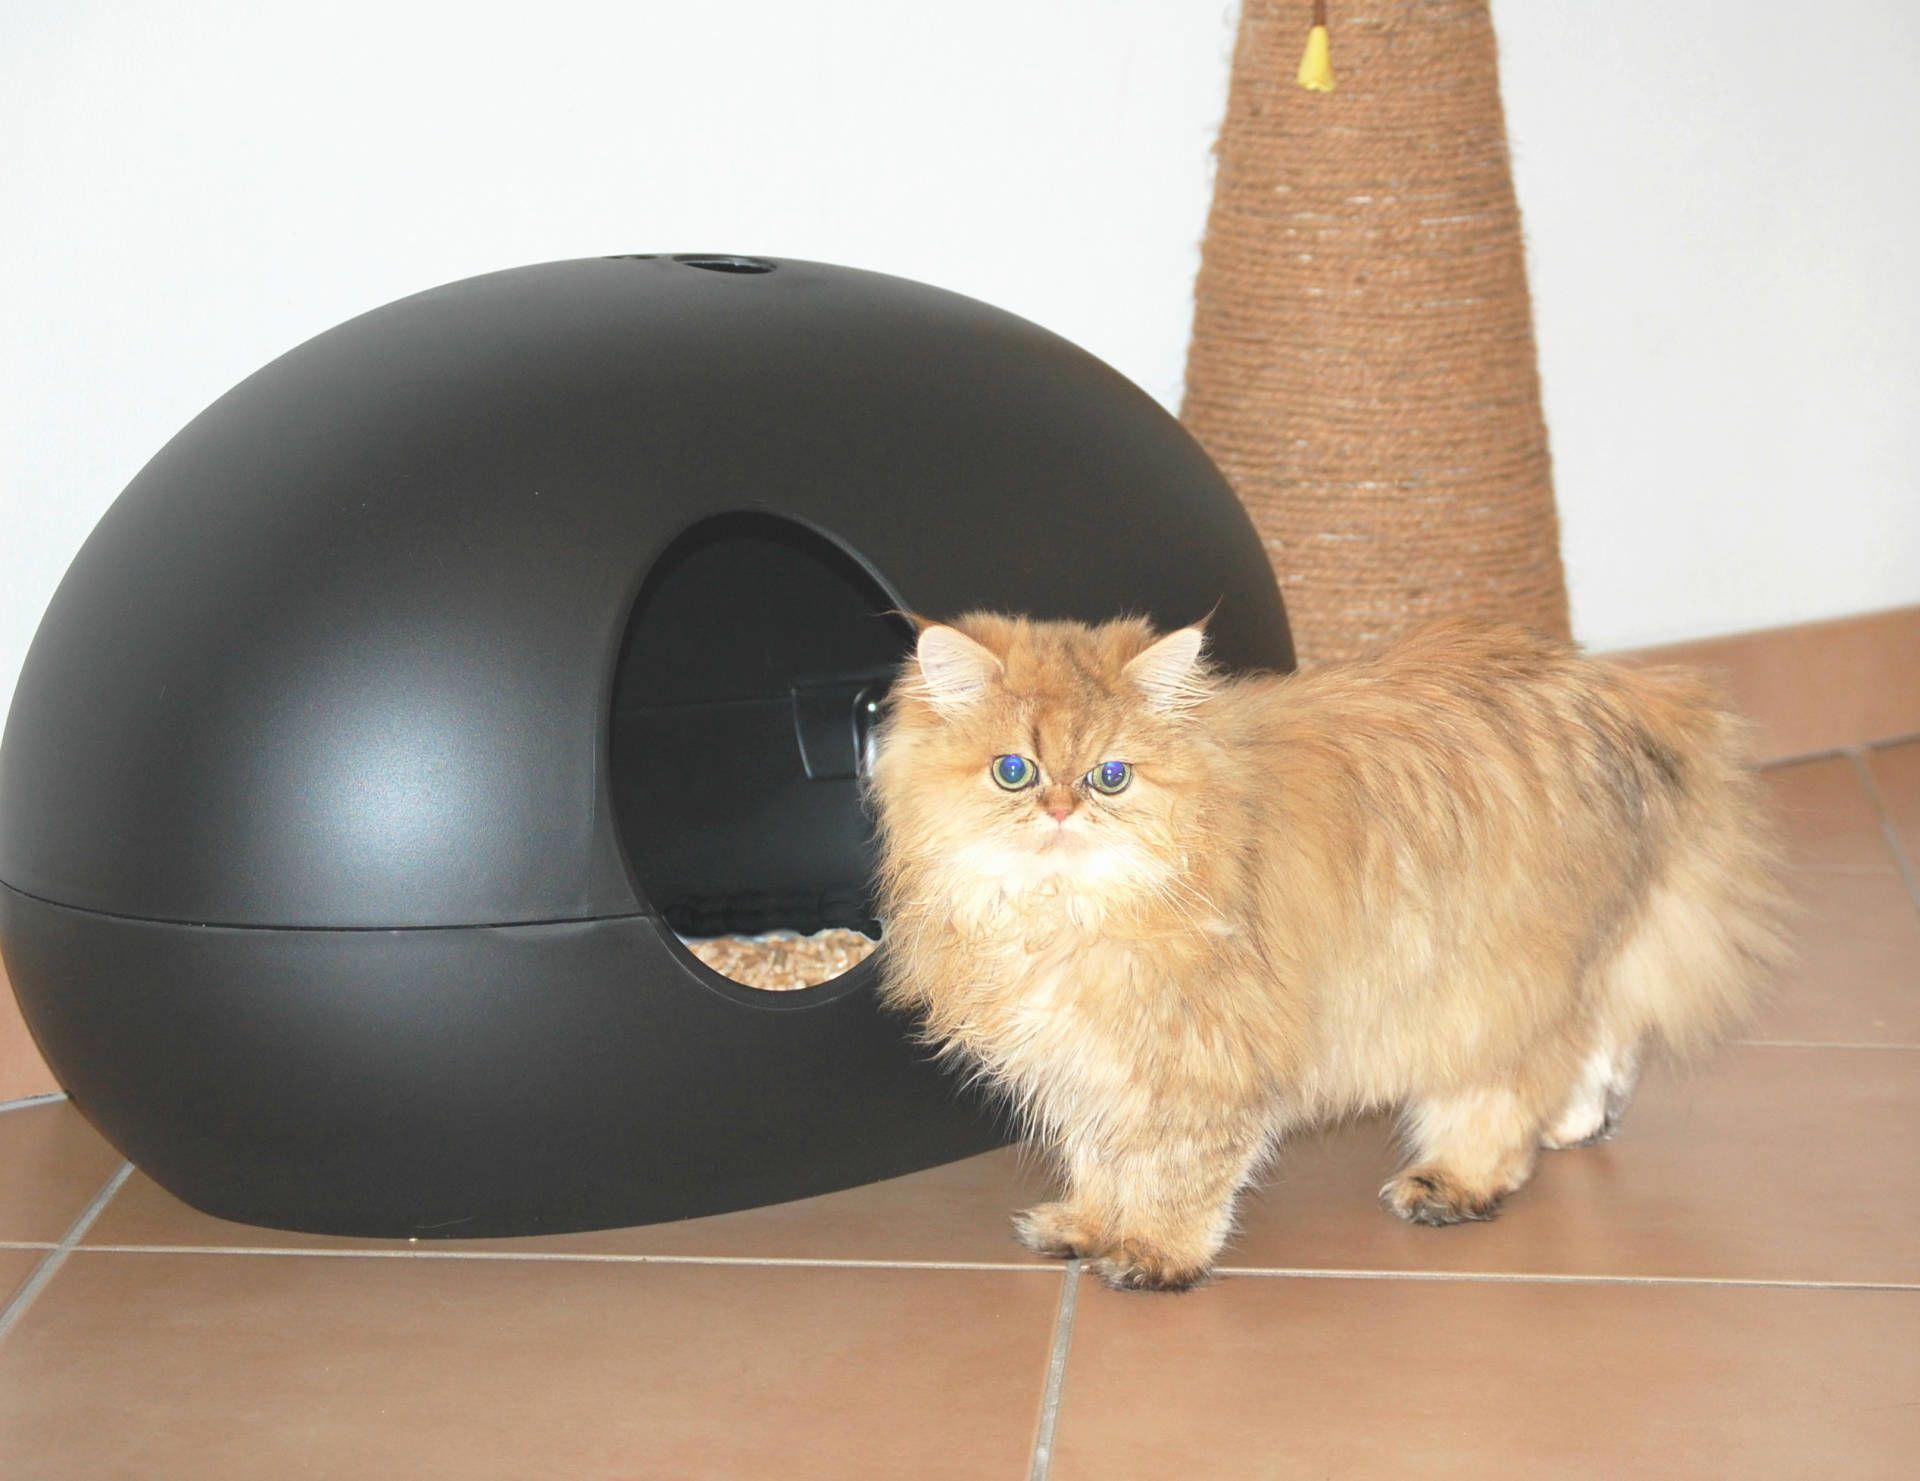 Cats In Apartments Cat Litter Box Genie Best Cat Litter Box Cat Friendly Apartment In 2020 Best Cat Litter Cats And Kittens Cat Litter Box